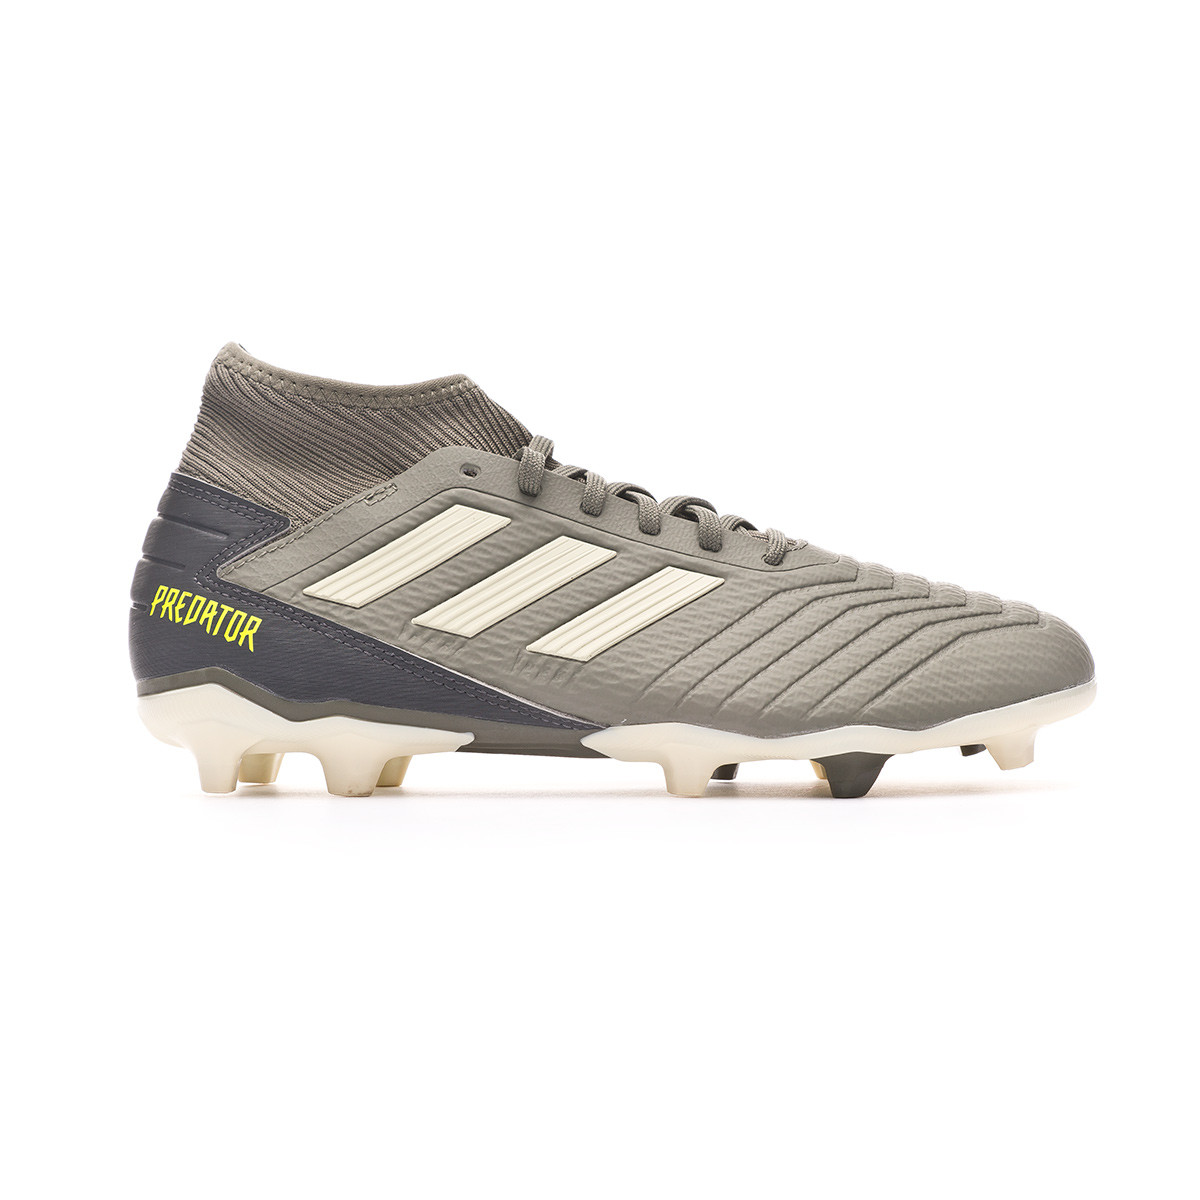 Football Boots adidas Predator 19.3 FG